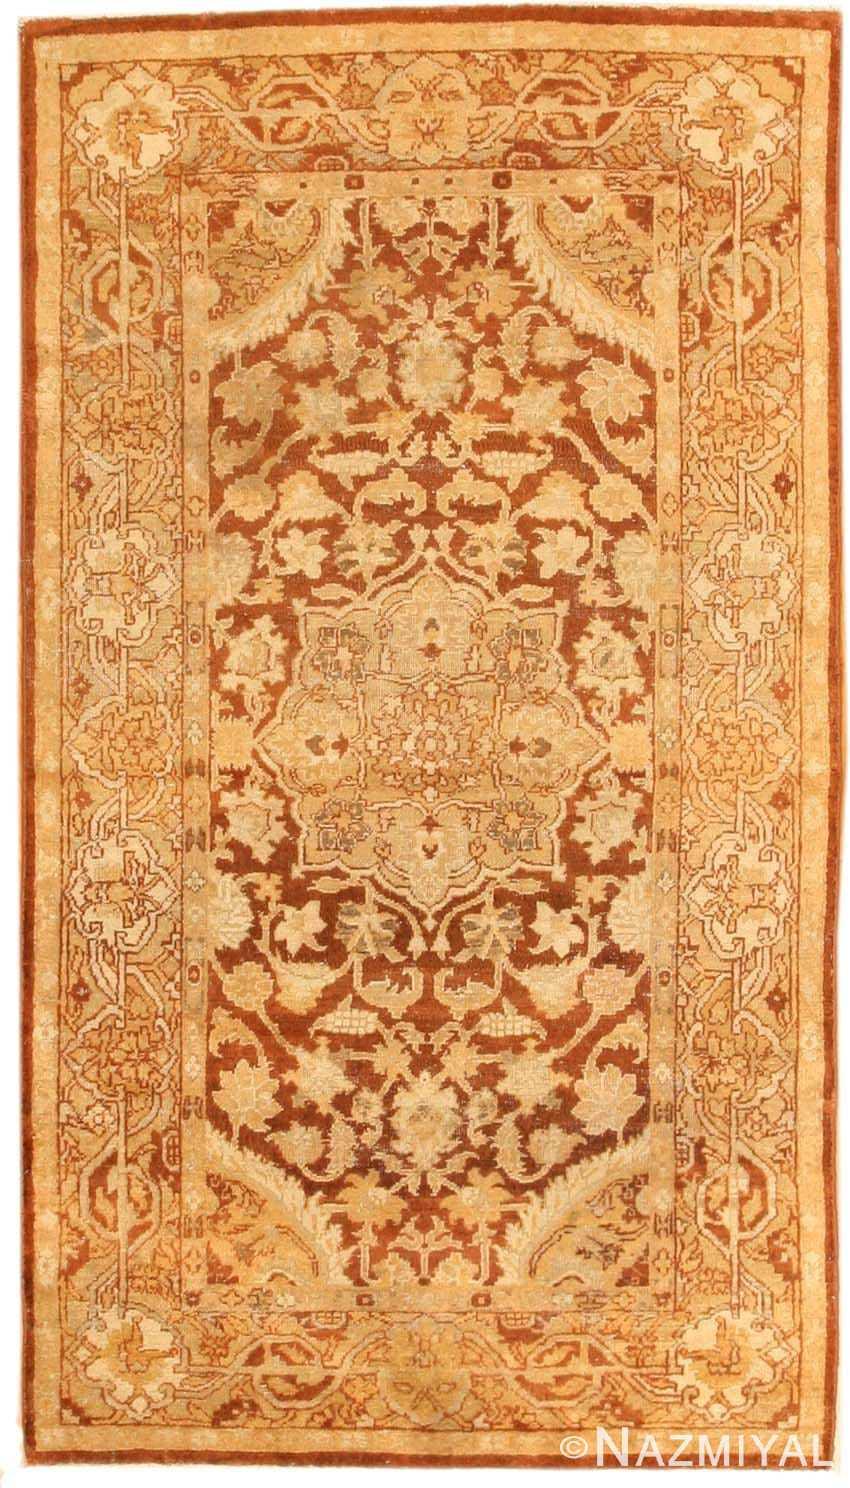 Antique Amritsar Rug 40707 Detail/Large View